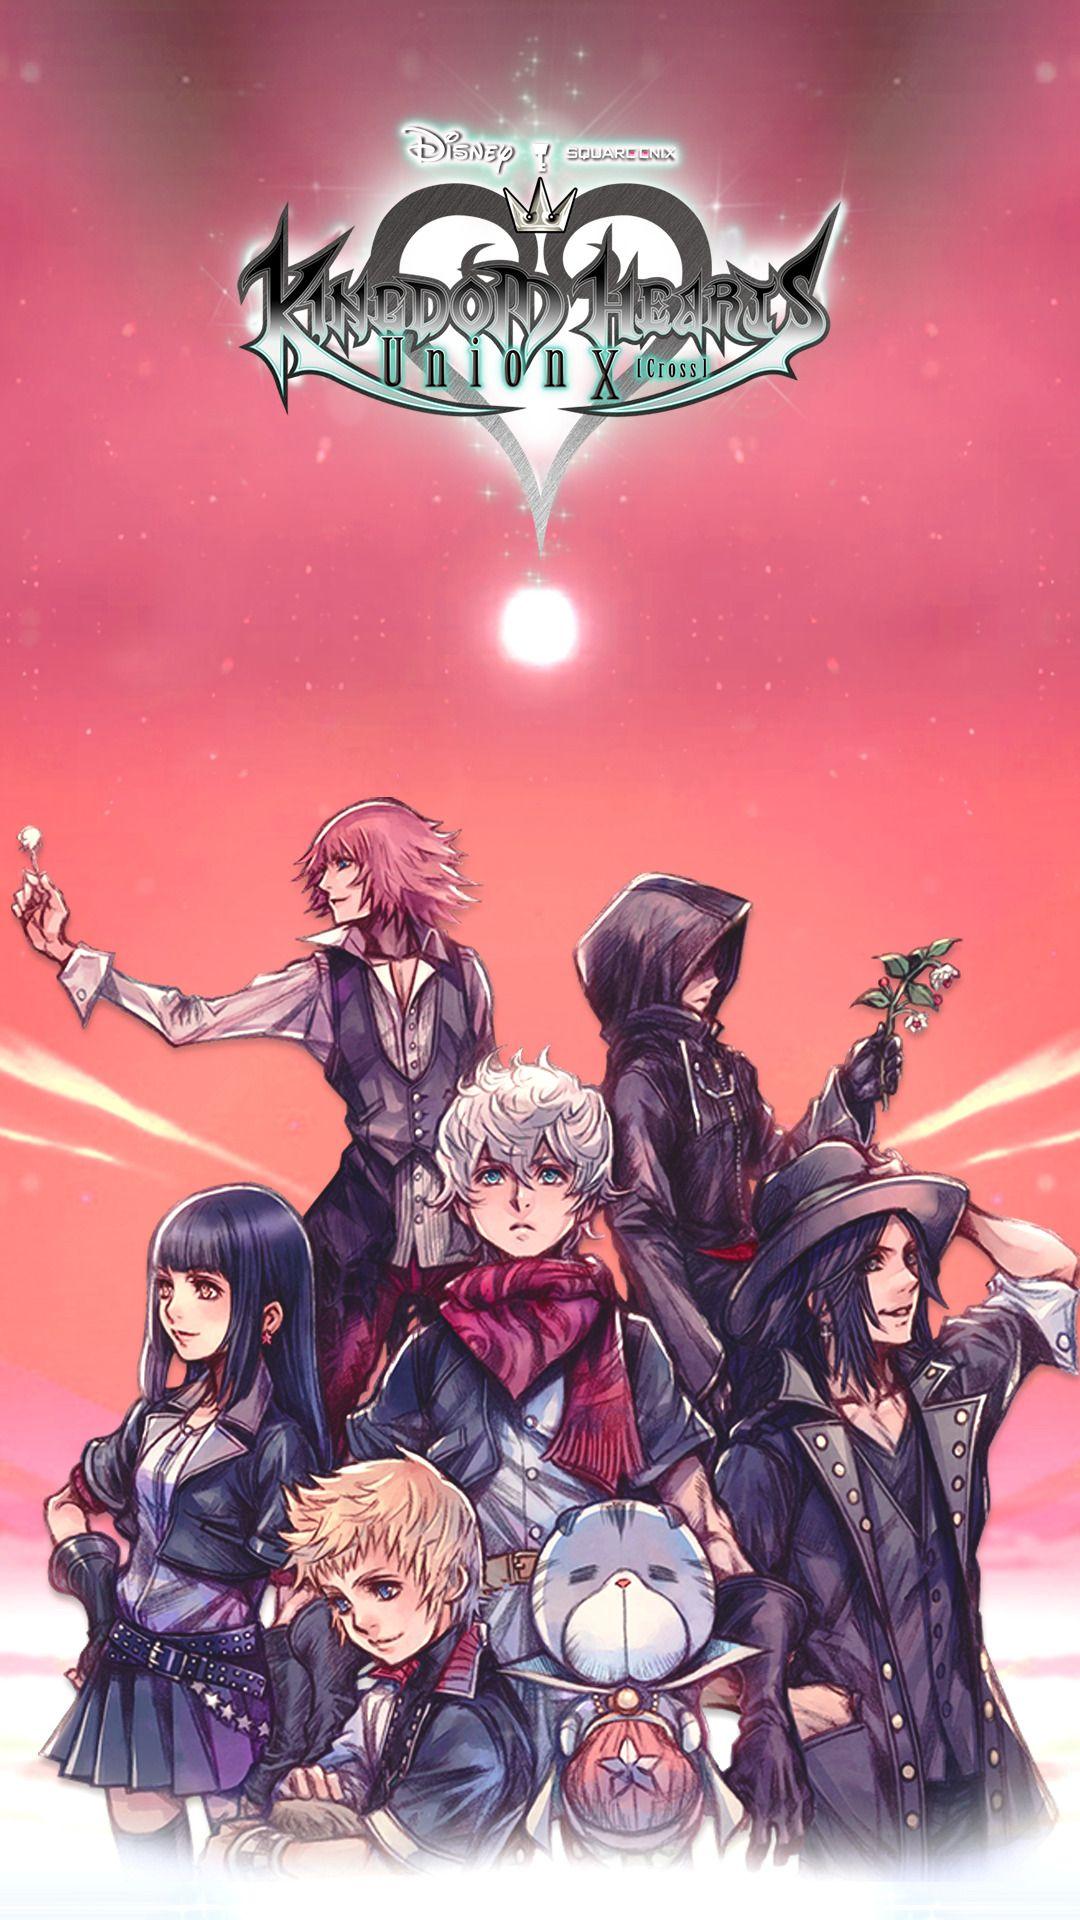 Khux Mobile Wallpaper Full Resolution Here Kingdom Hearts